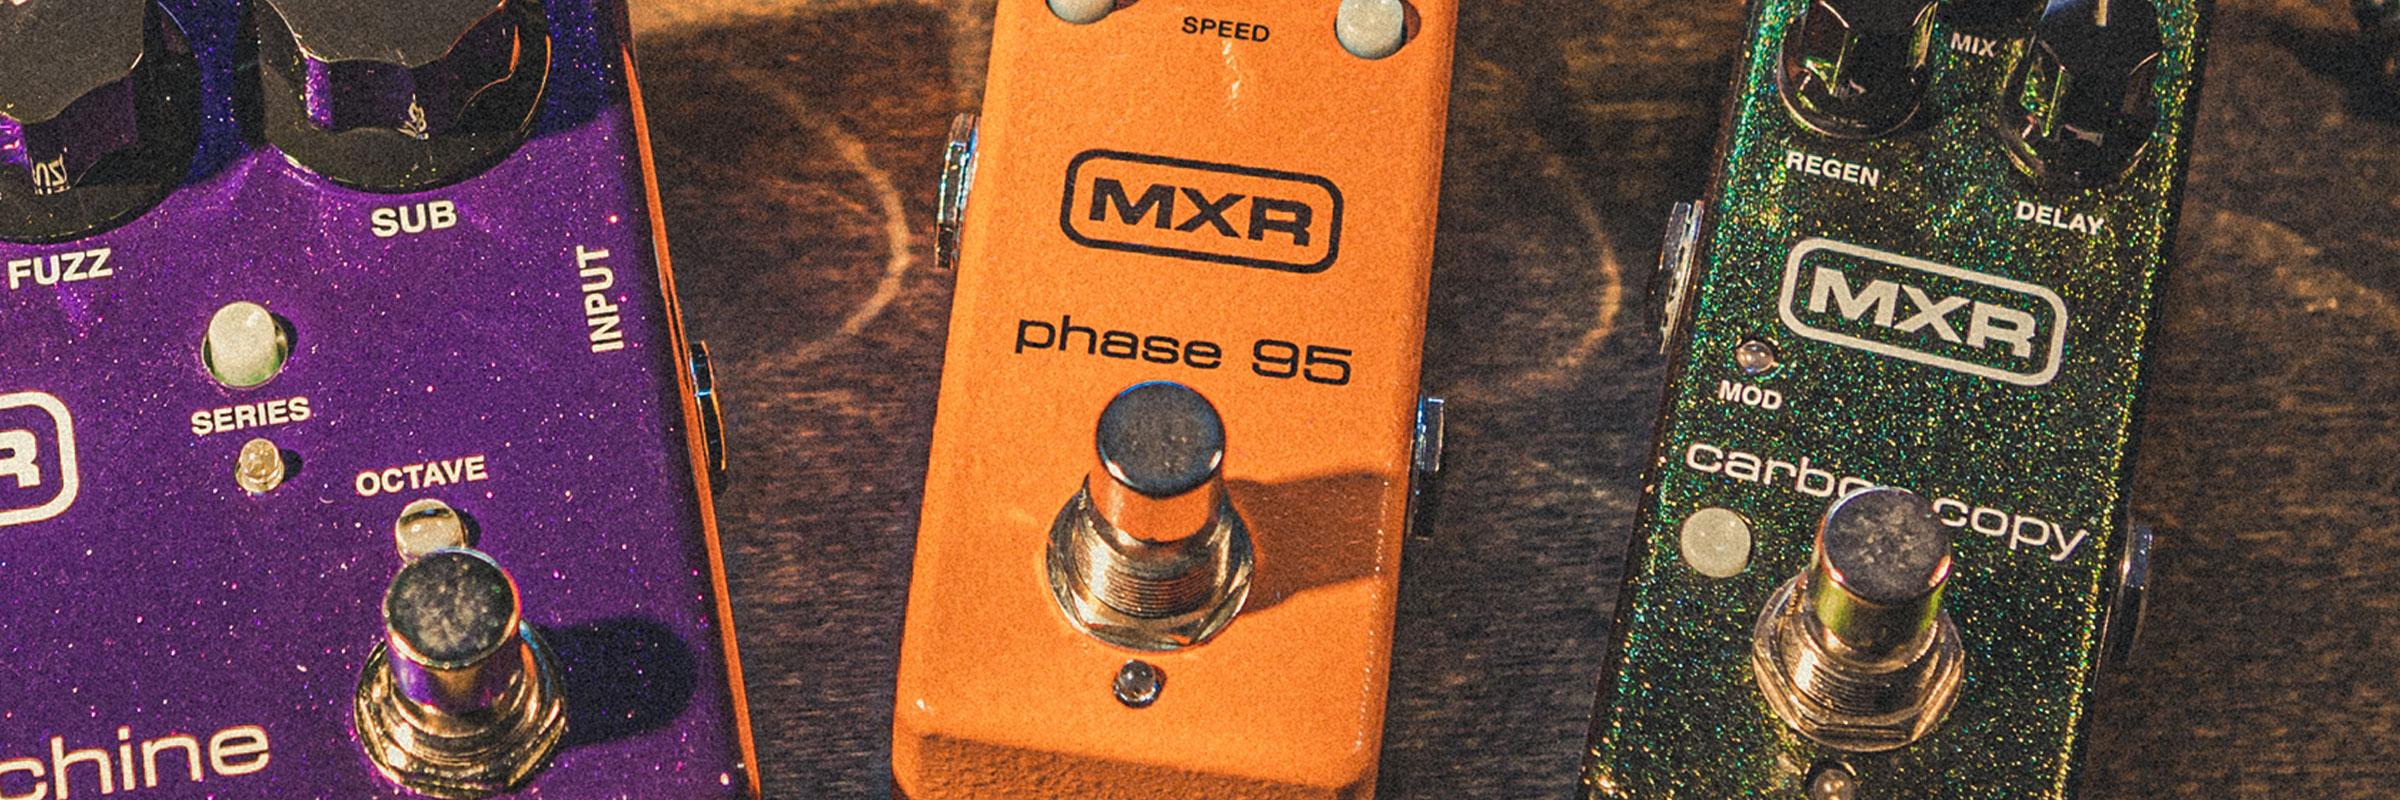 MXR<sup>®</sup> PHASE 95